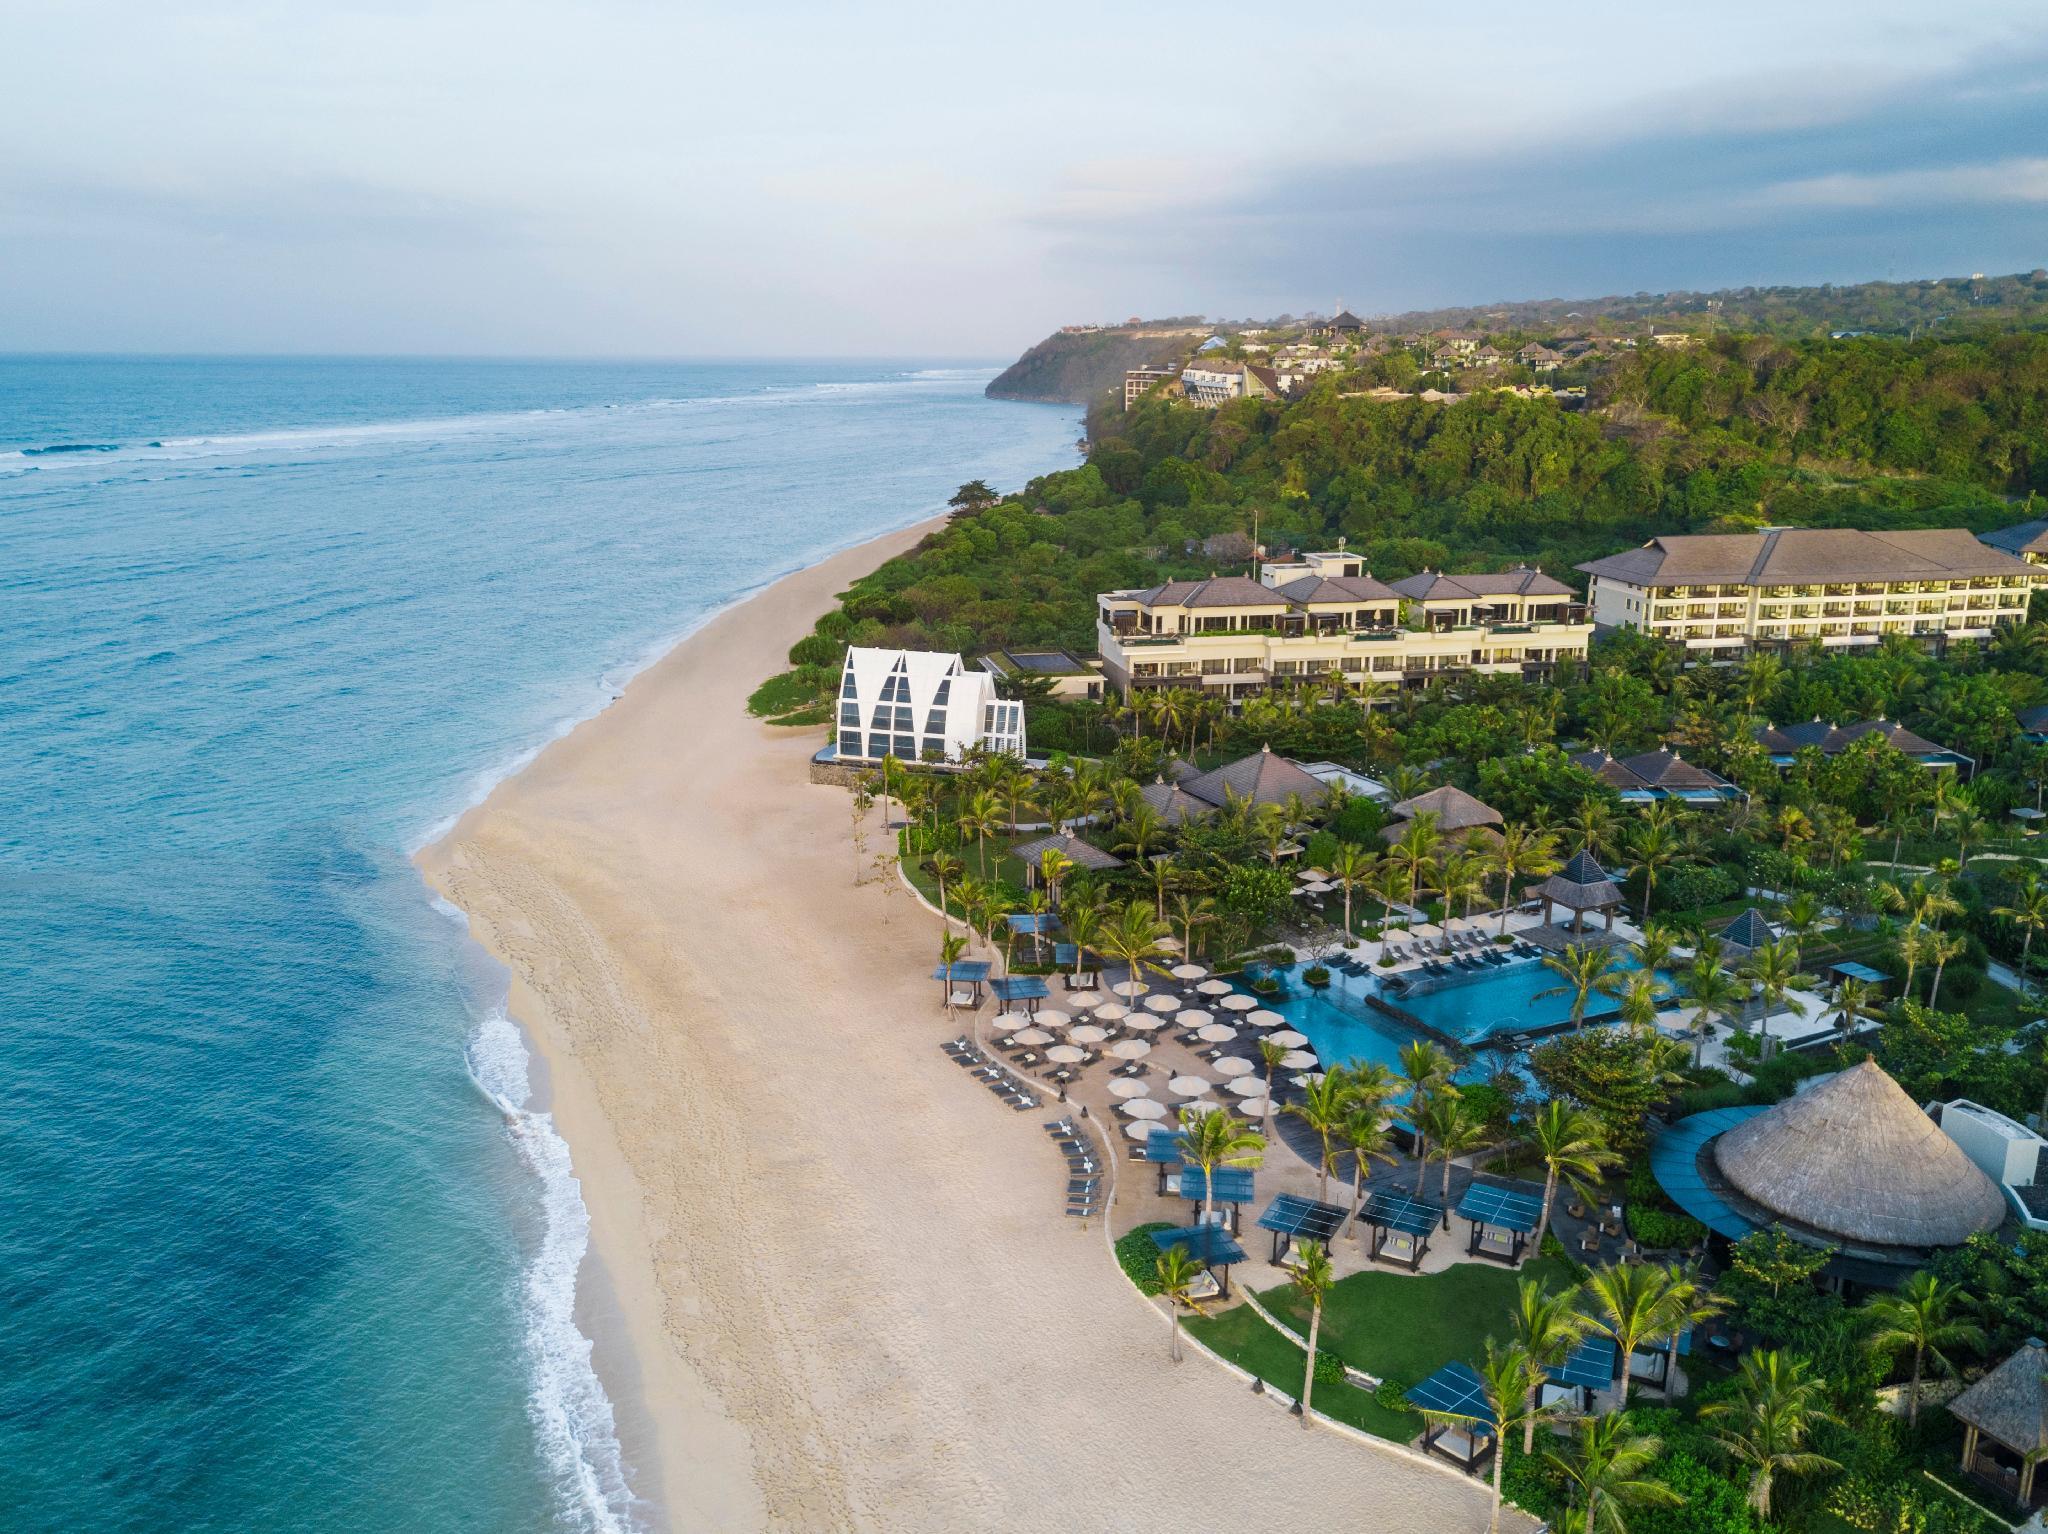 The Ritz Carlton Bali Villas